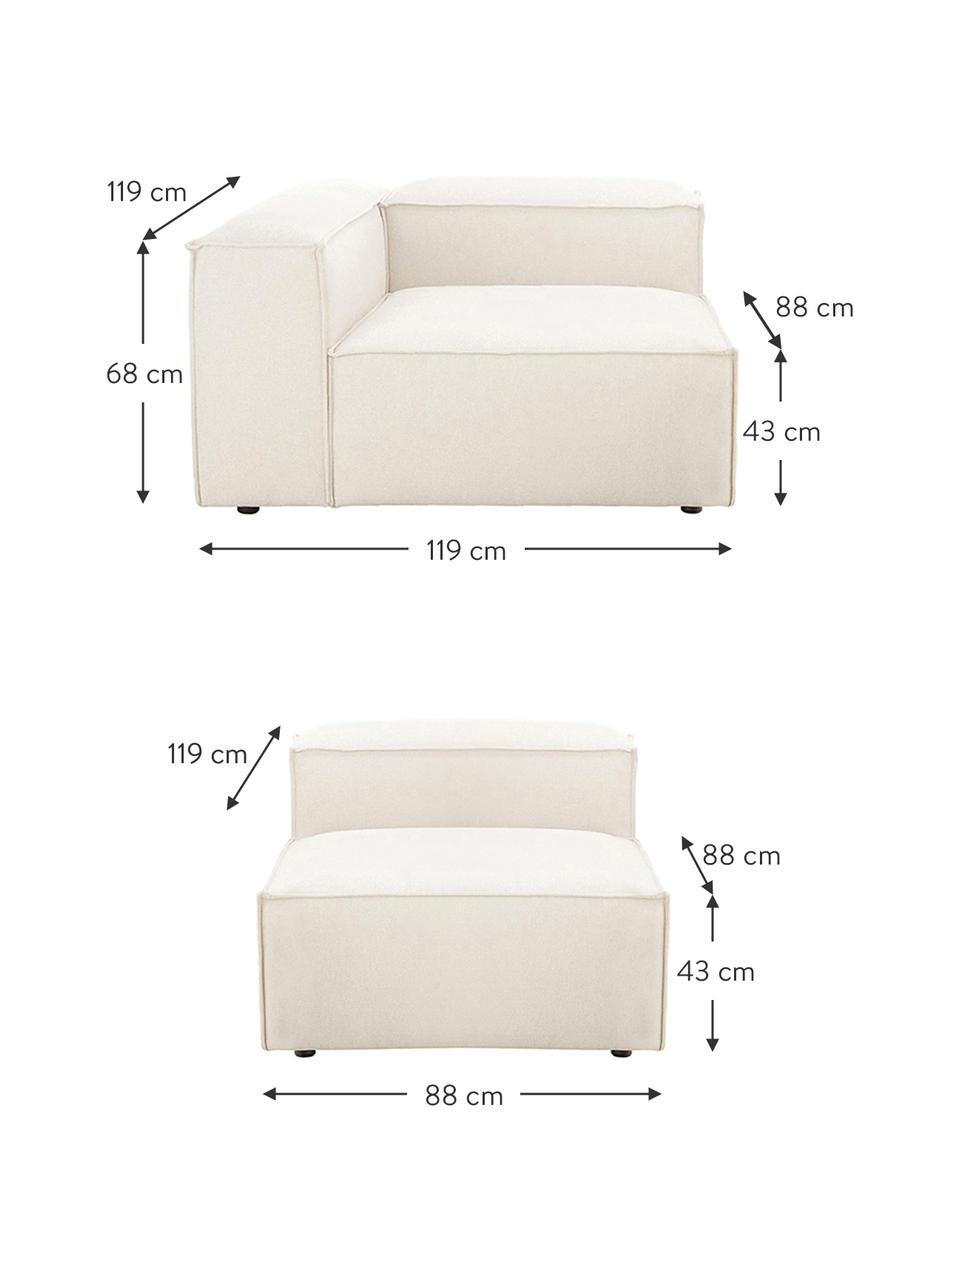 Modulares Sofa Lennon (4-Sitzer) in Beige, Bezug: Polyester Der hochwertige, Gestell: Massives Kiefernholz, Spe, Webstoff Beige, B 327 x T 119 cm